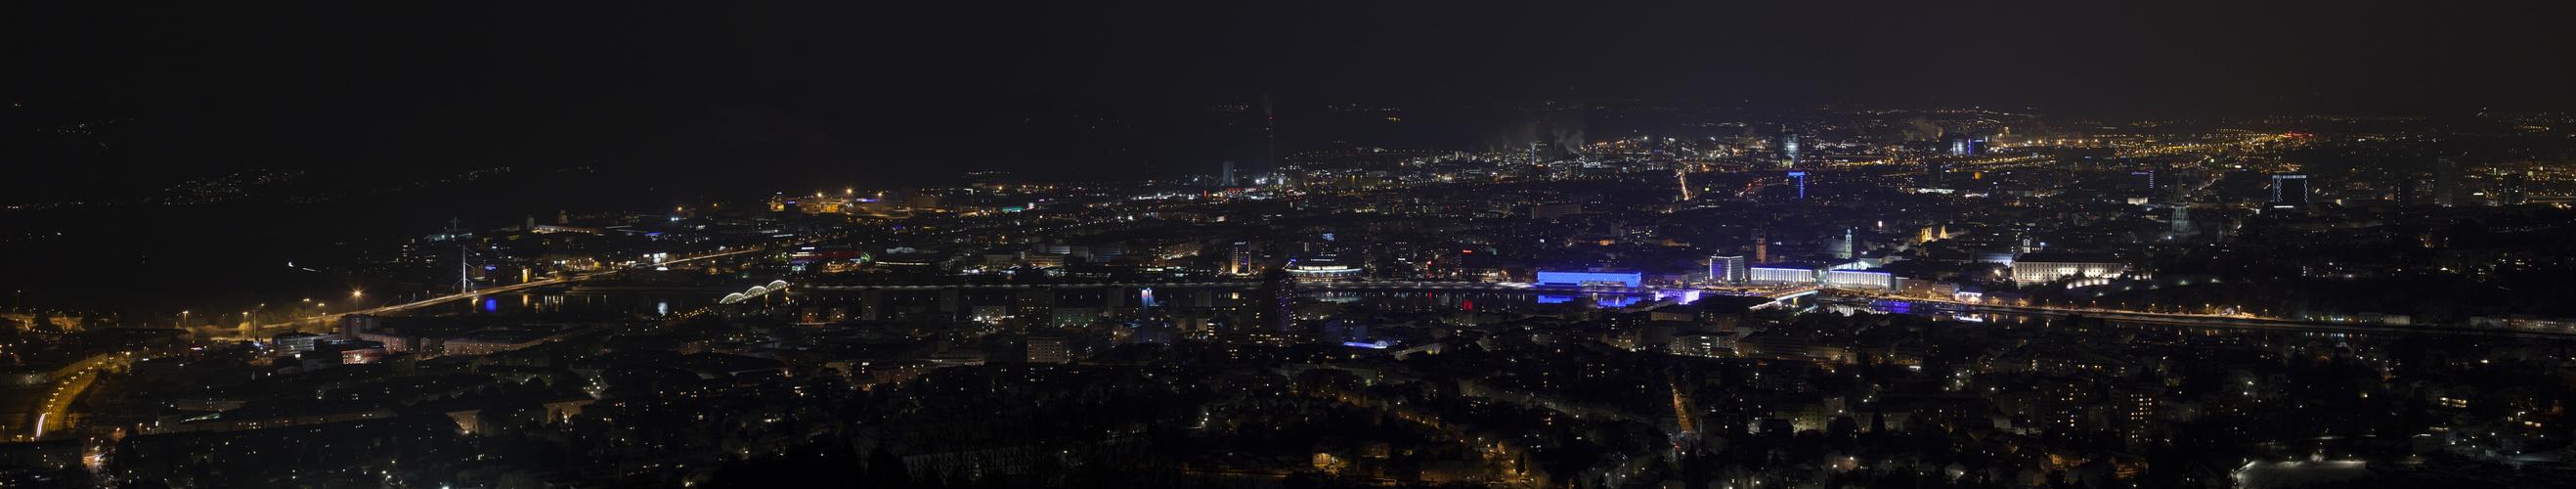 Linz - Nachtpanorama